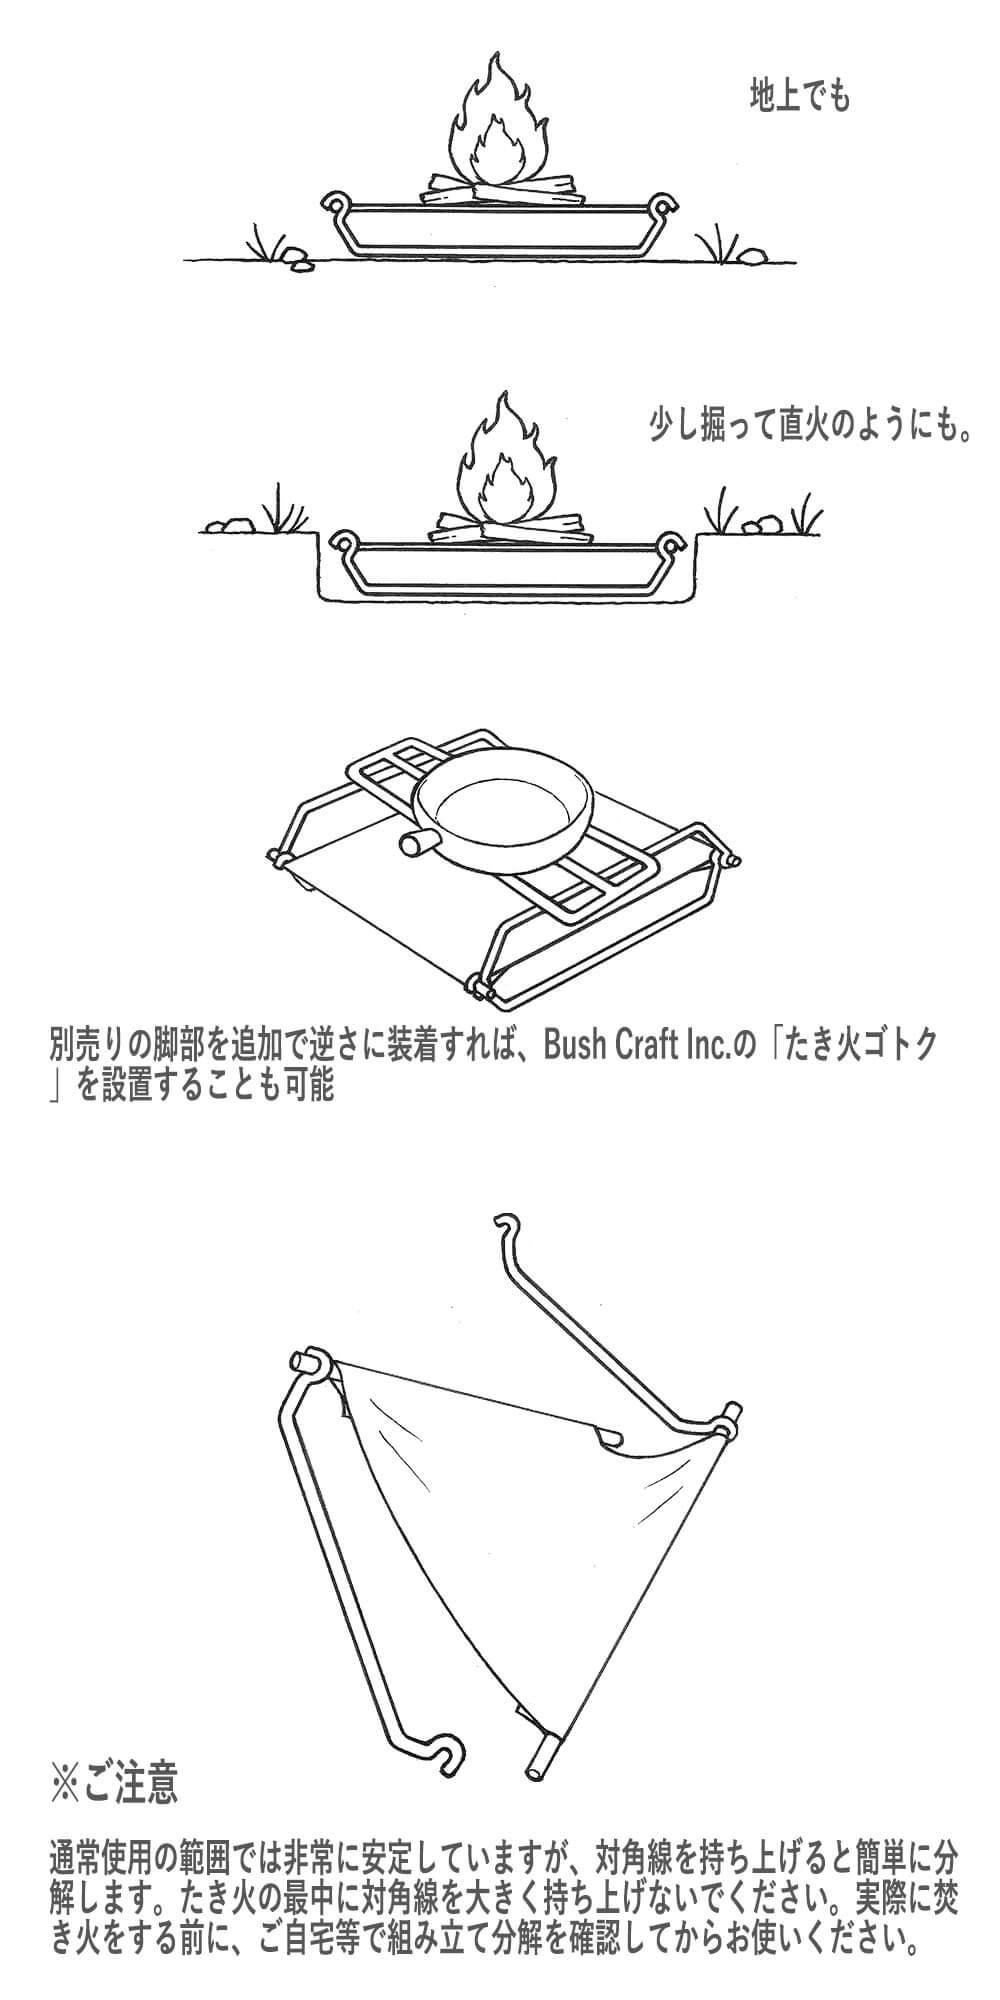 Bush Craft Inc. Ultra Light Fire Stand ブッシュクラフト ウルトラライト ファイヤースタンド 35×44 Ver.1.0 たき火台 キャンプ アウトドア バックパッキング CAMP OUTDOOR